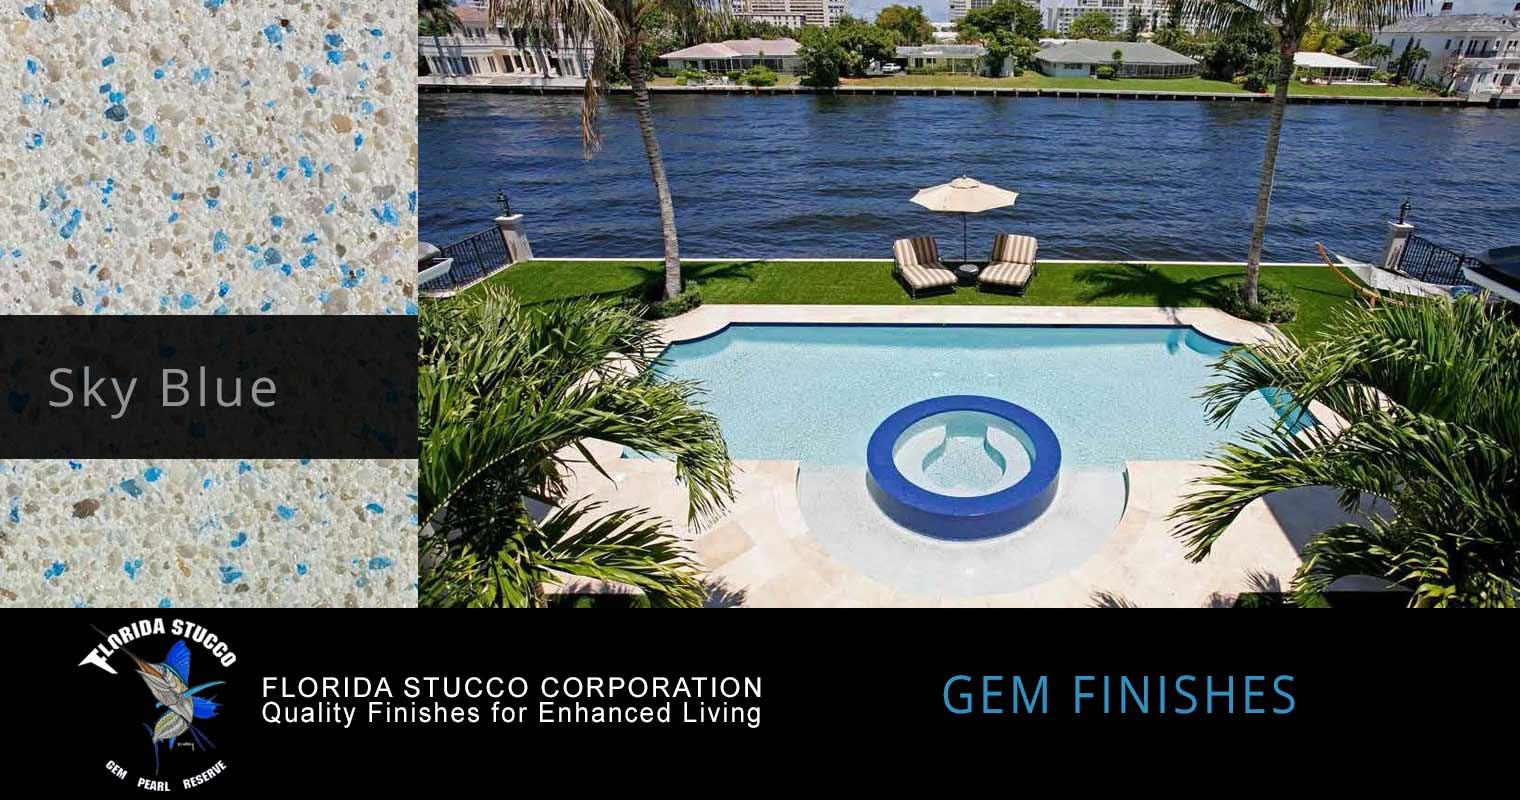 Florida Stucco - Sky Blue Plastering Finish Pool Sample 3